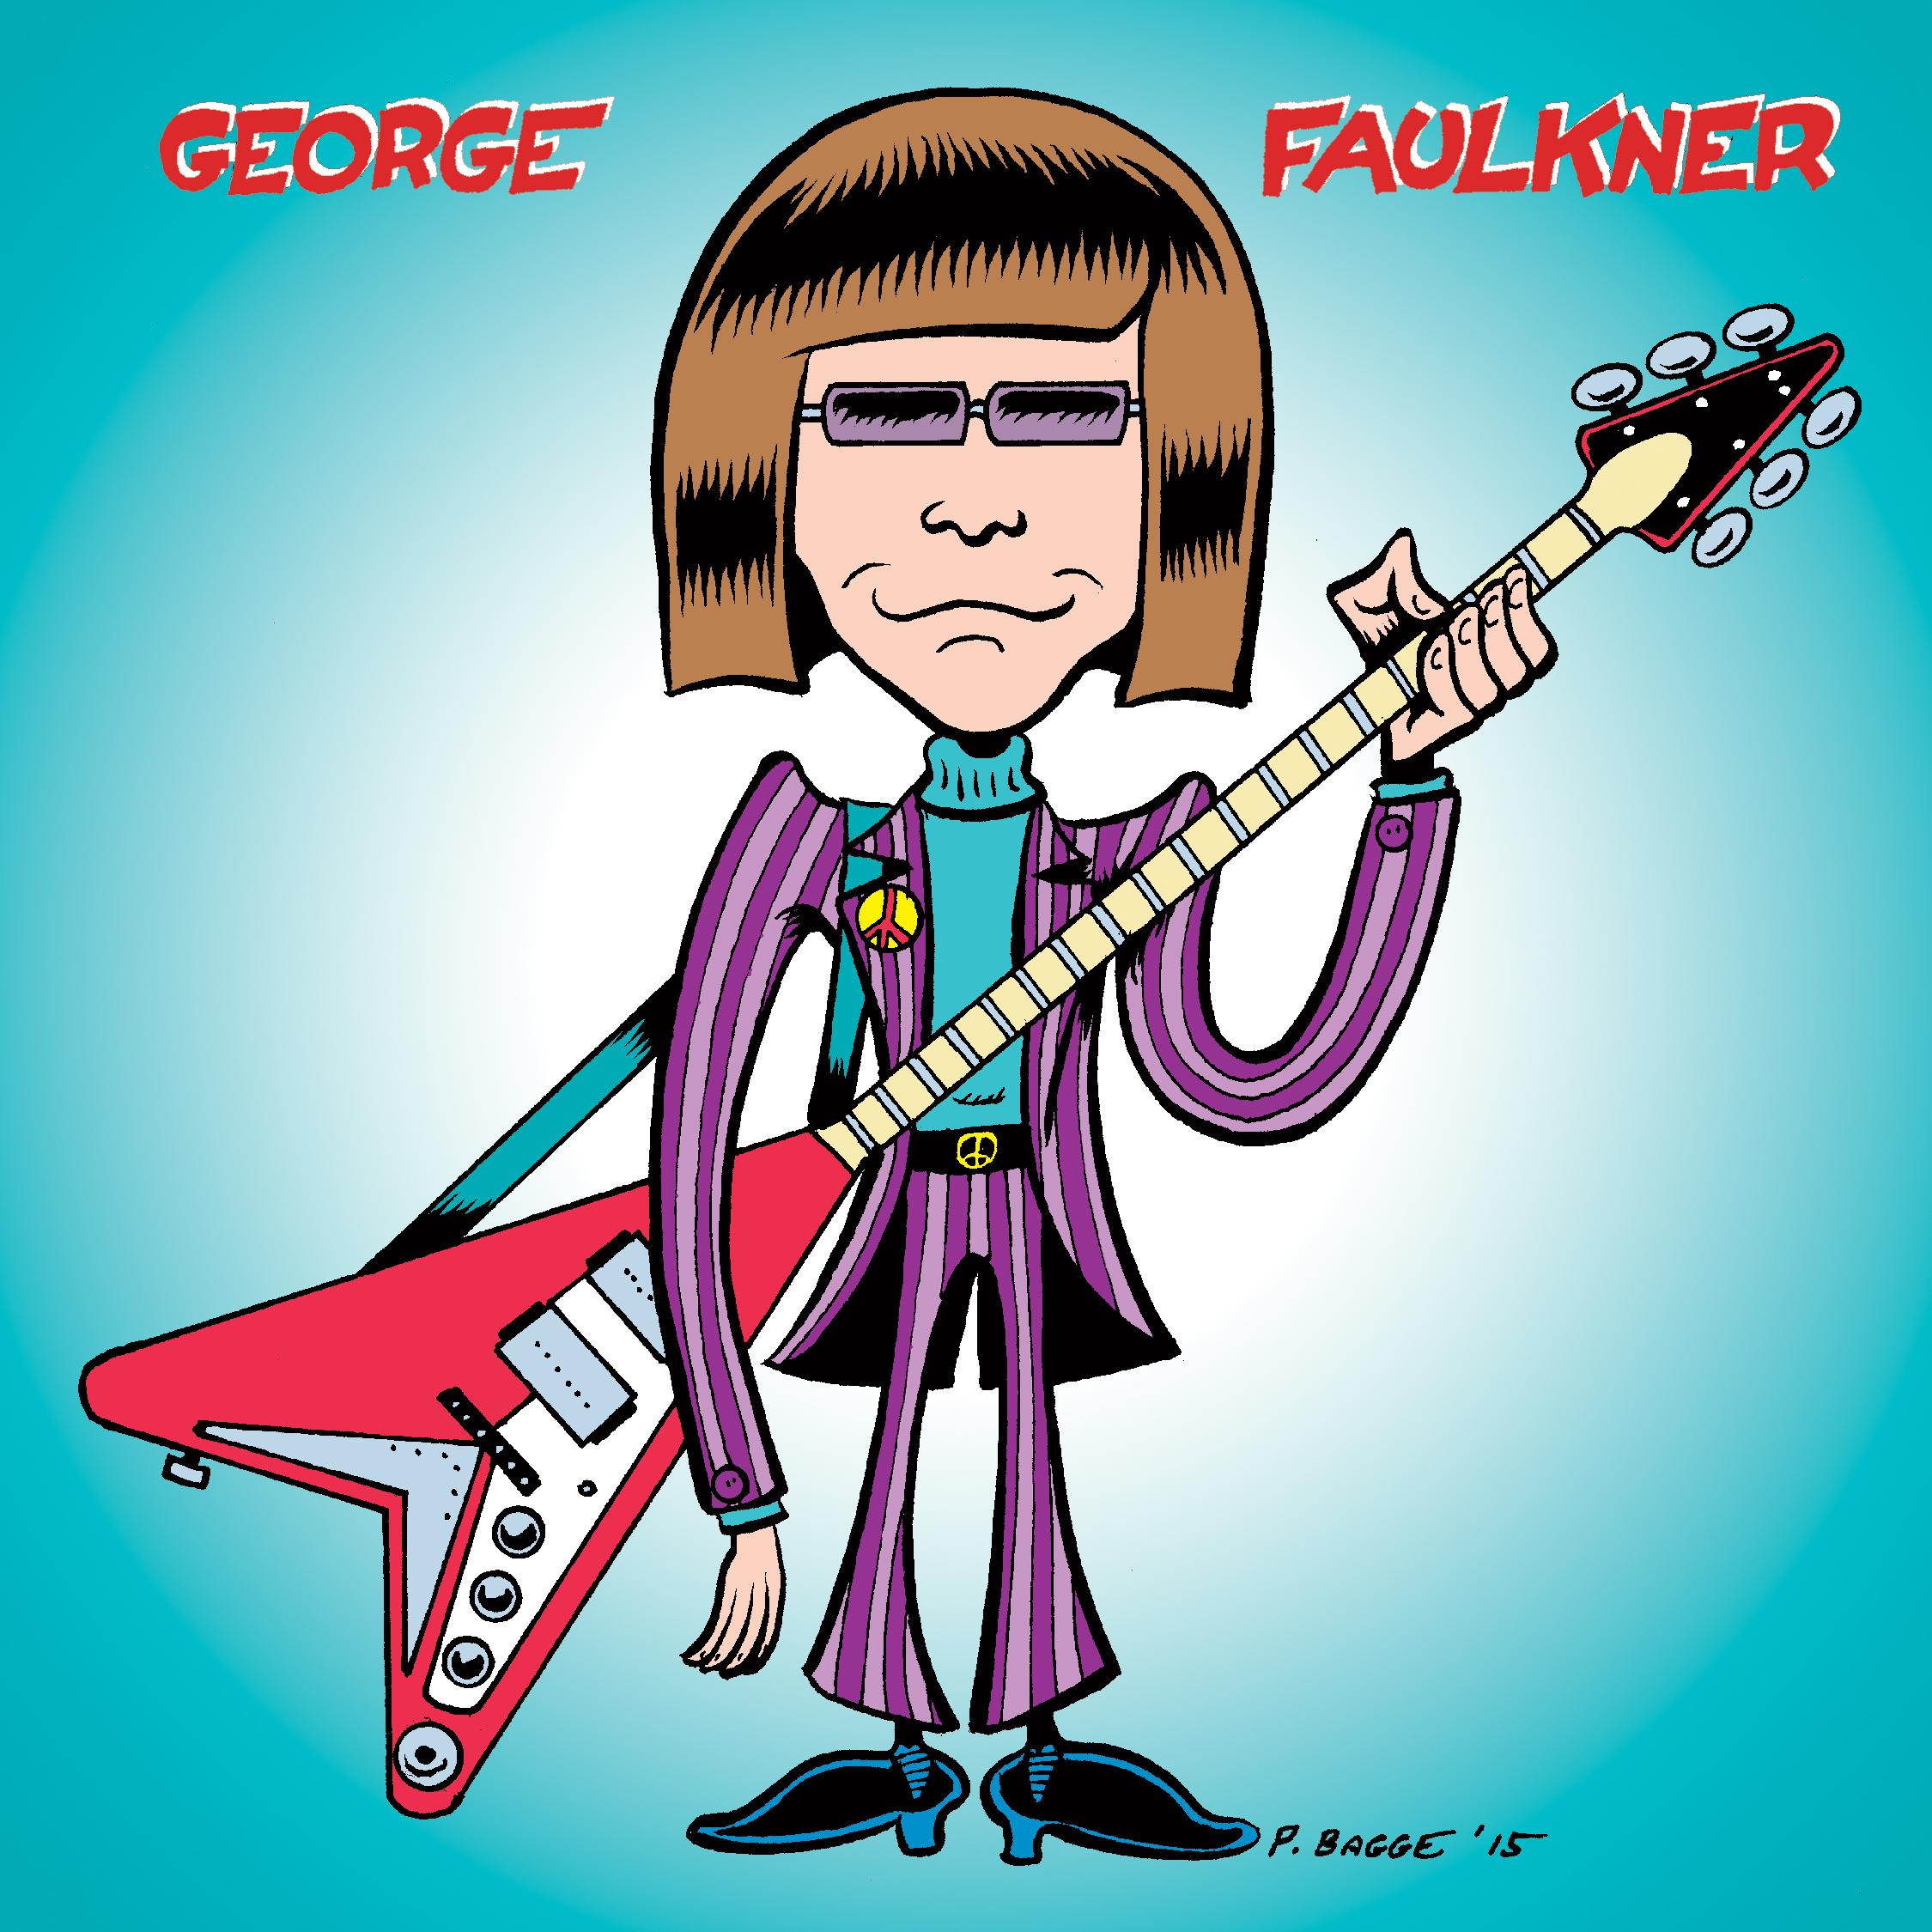 FaulknerSingleCover